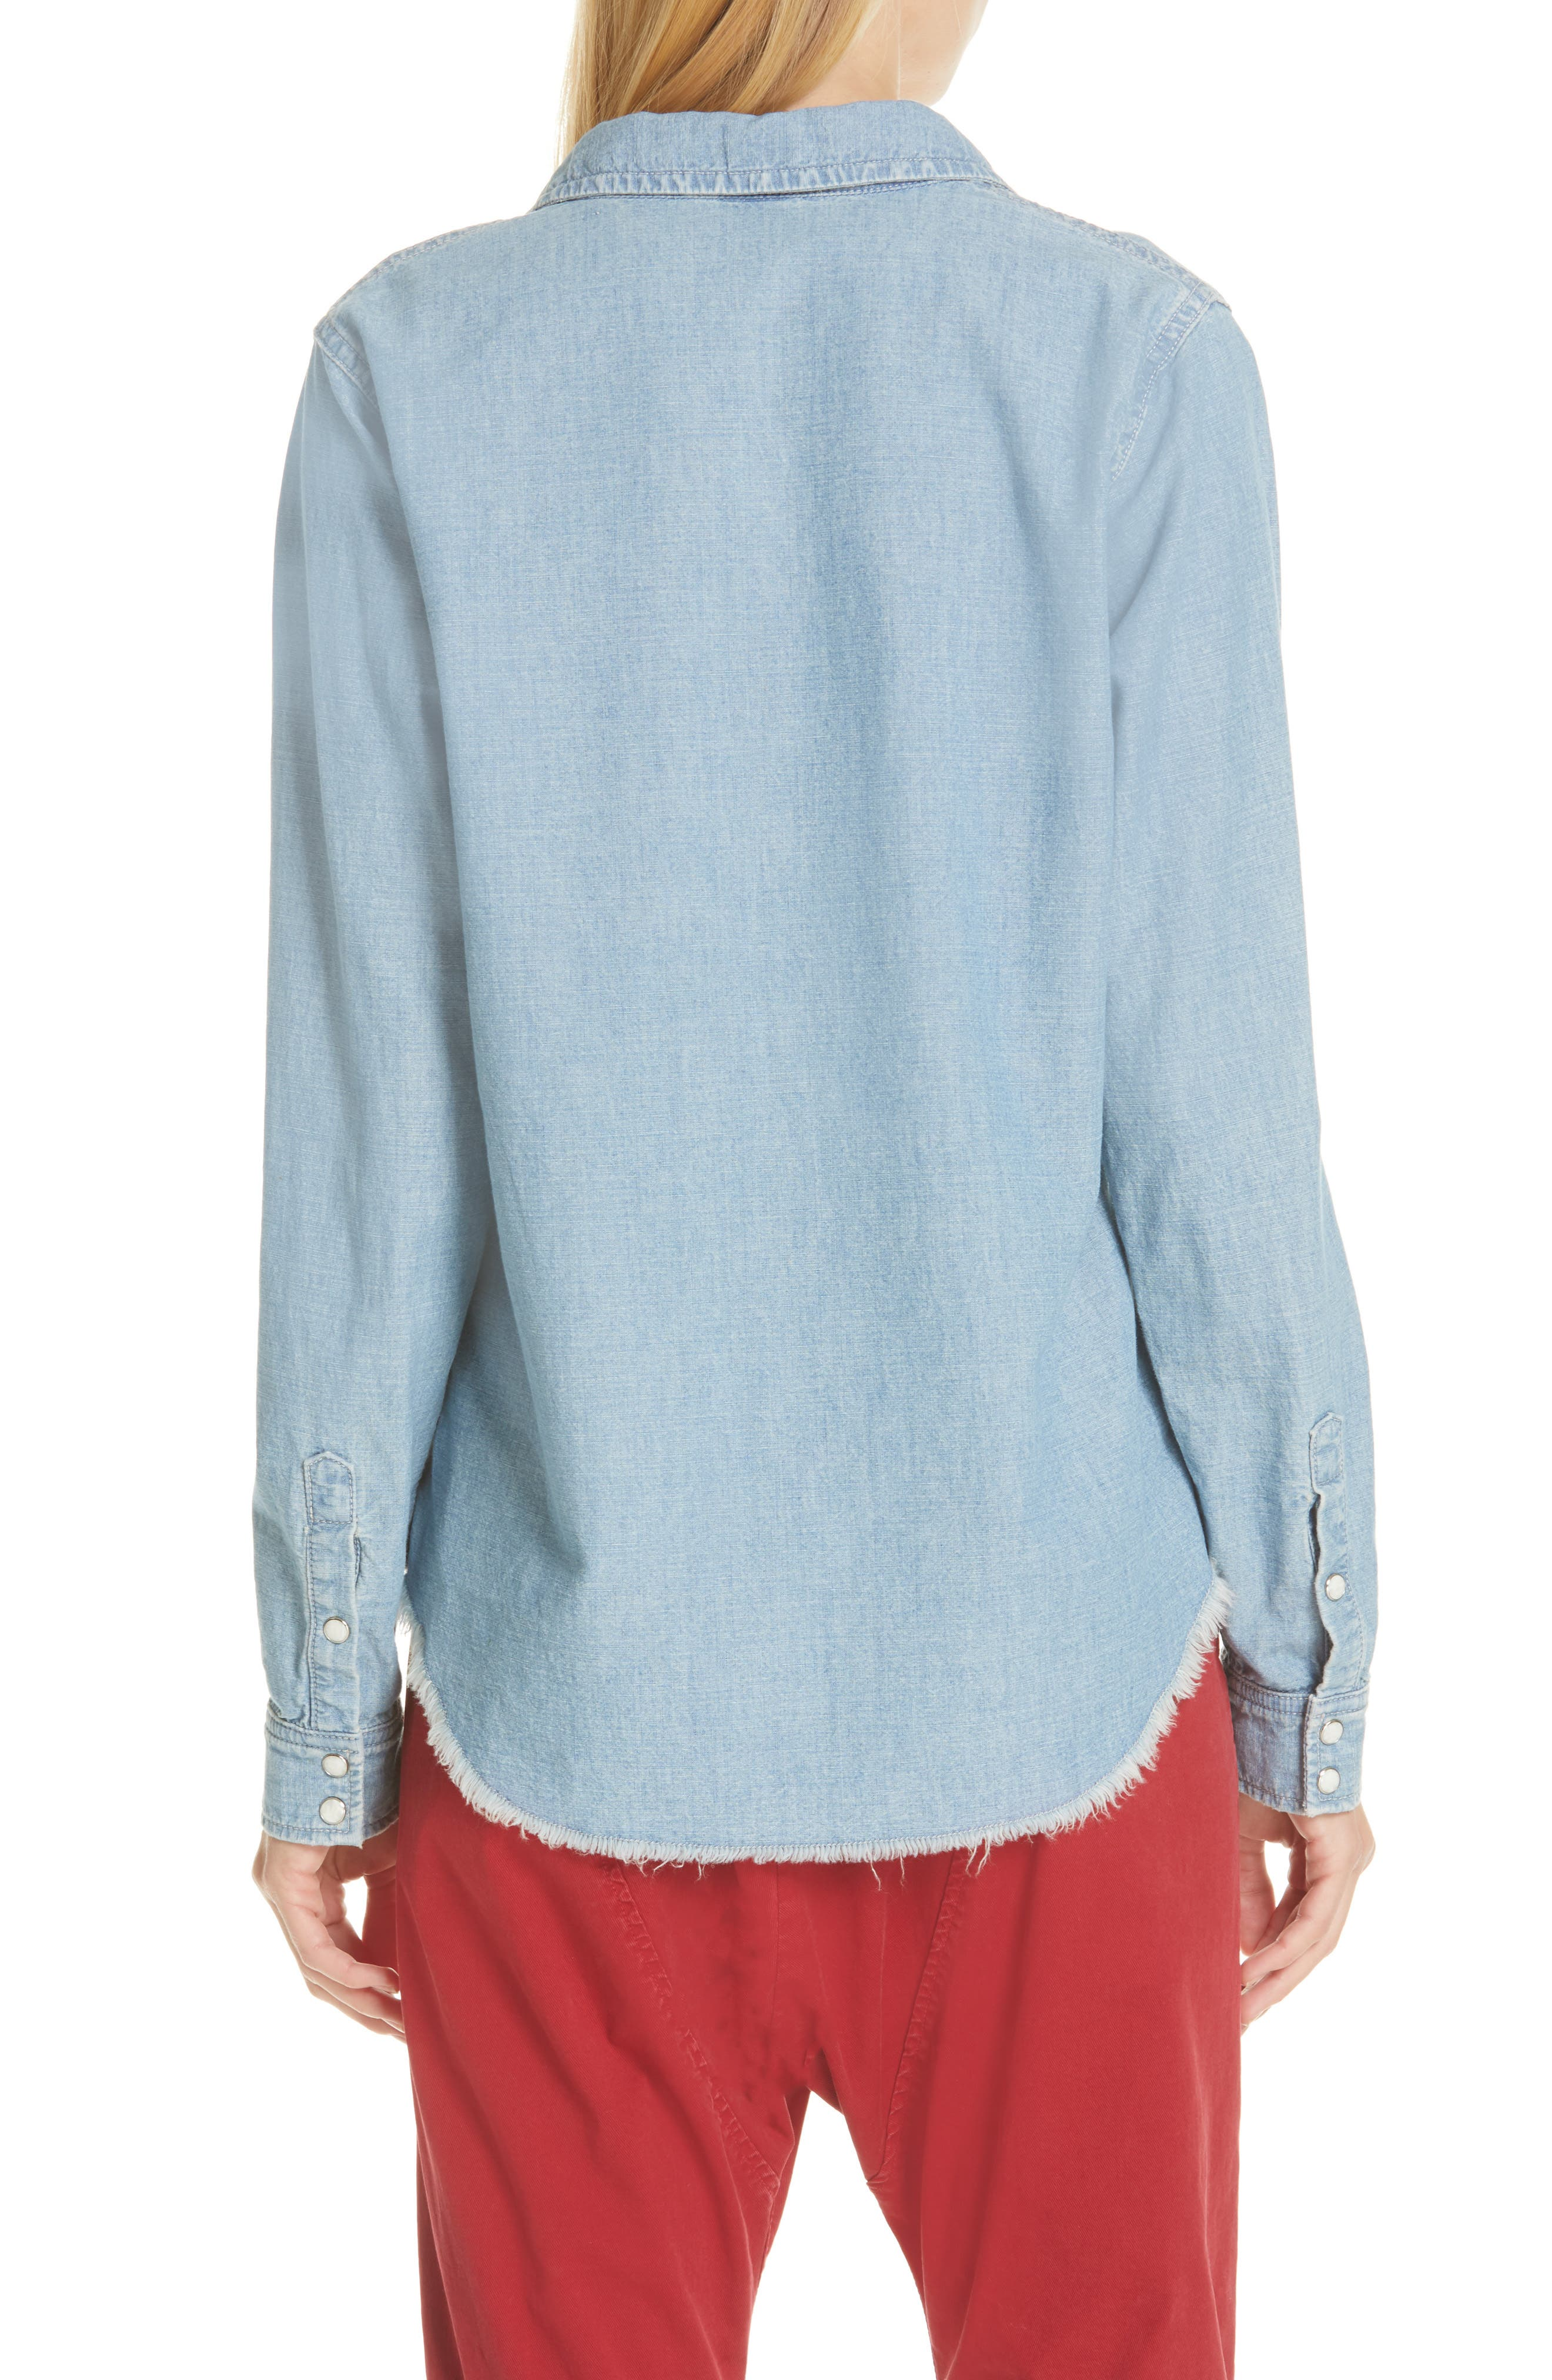 NILI LOTAN, Mallory Chambray Shirt, Alternate thumbnail 2, color, SKY BLUE